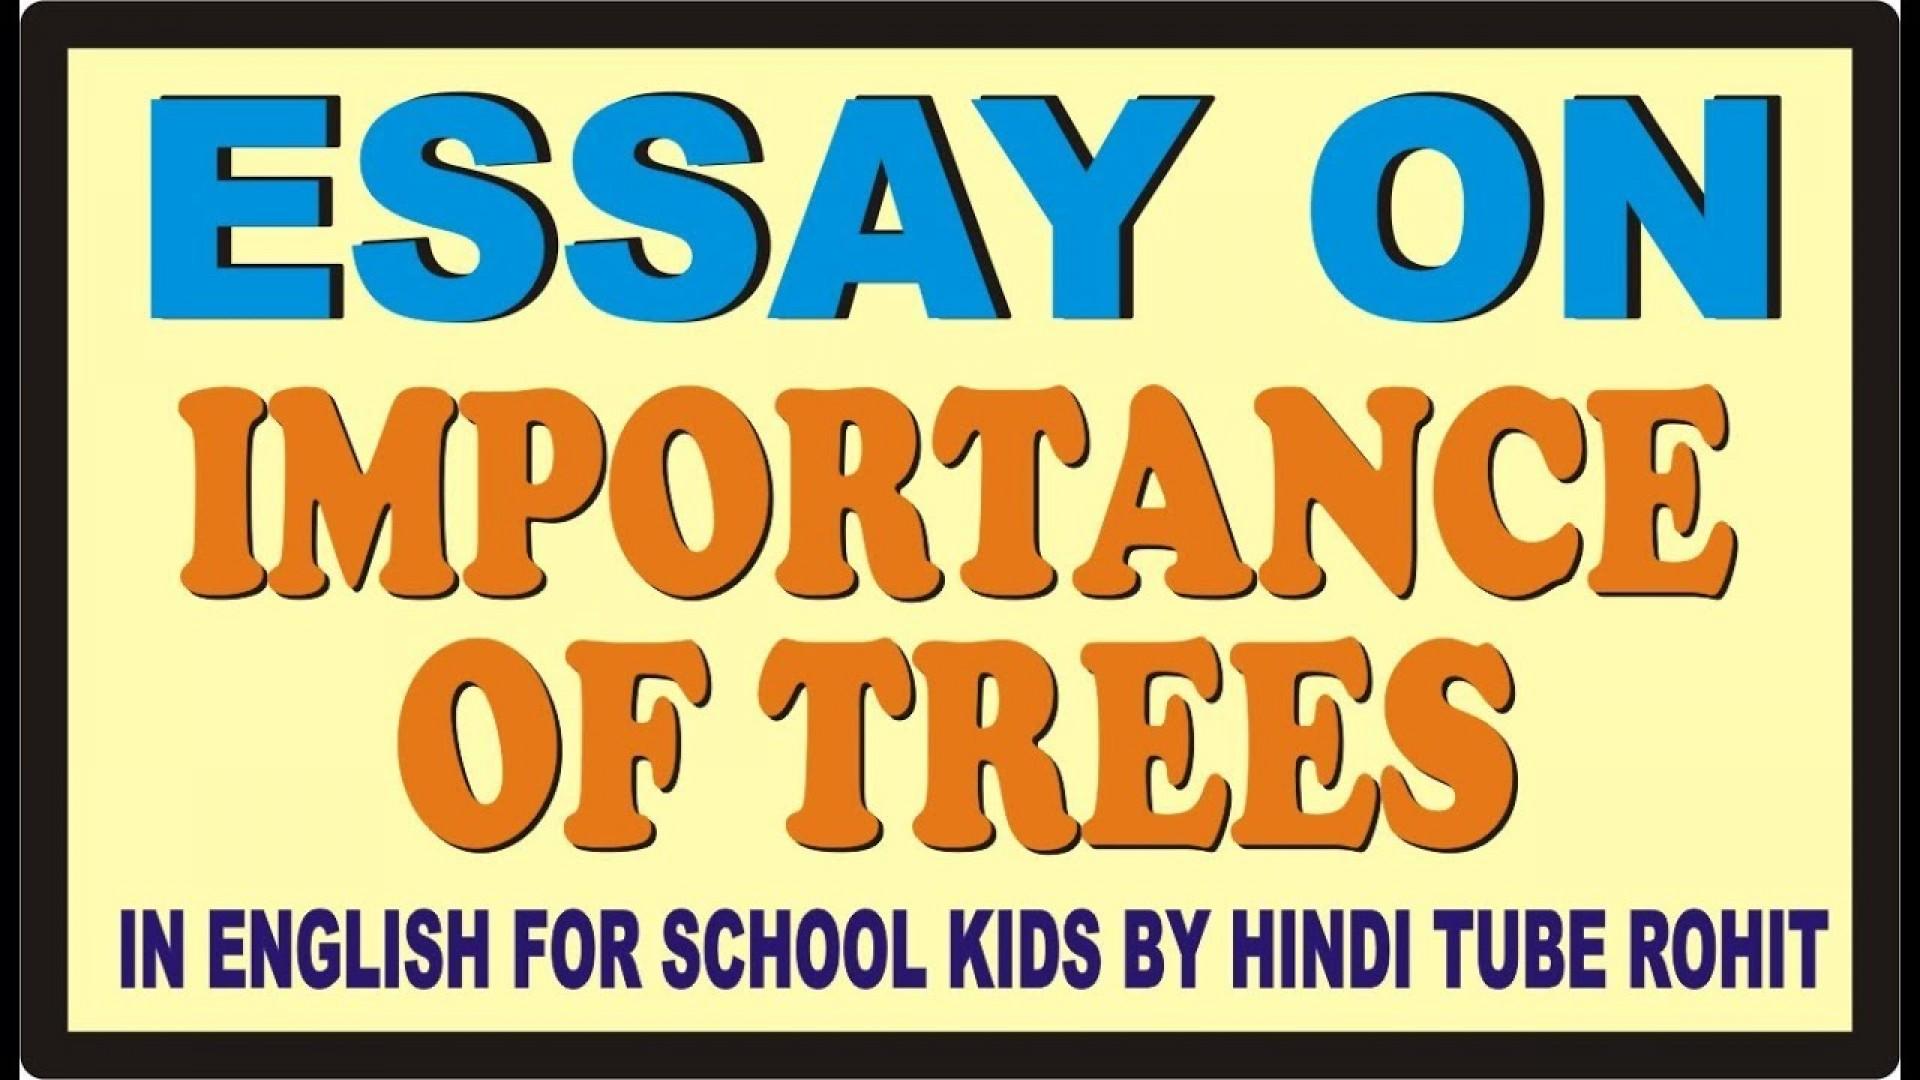 016 Description Of Trees For Essays Essay Example Striking 1920